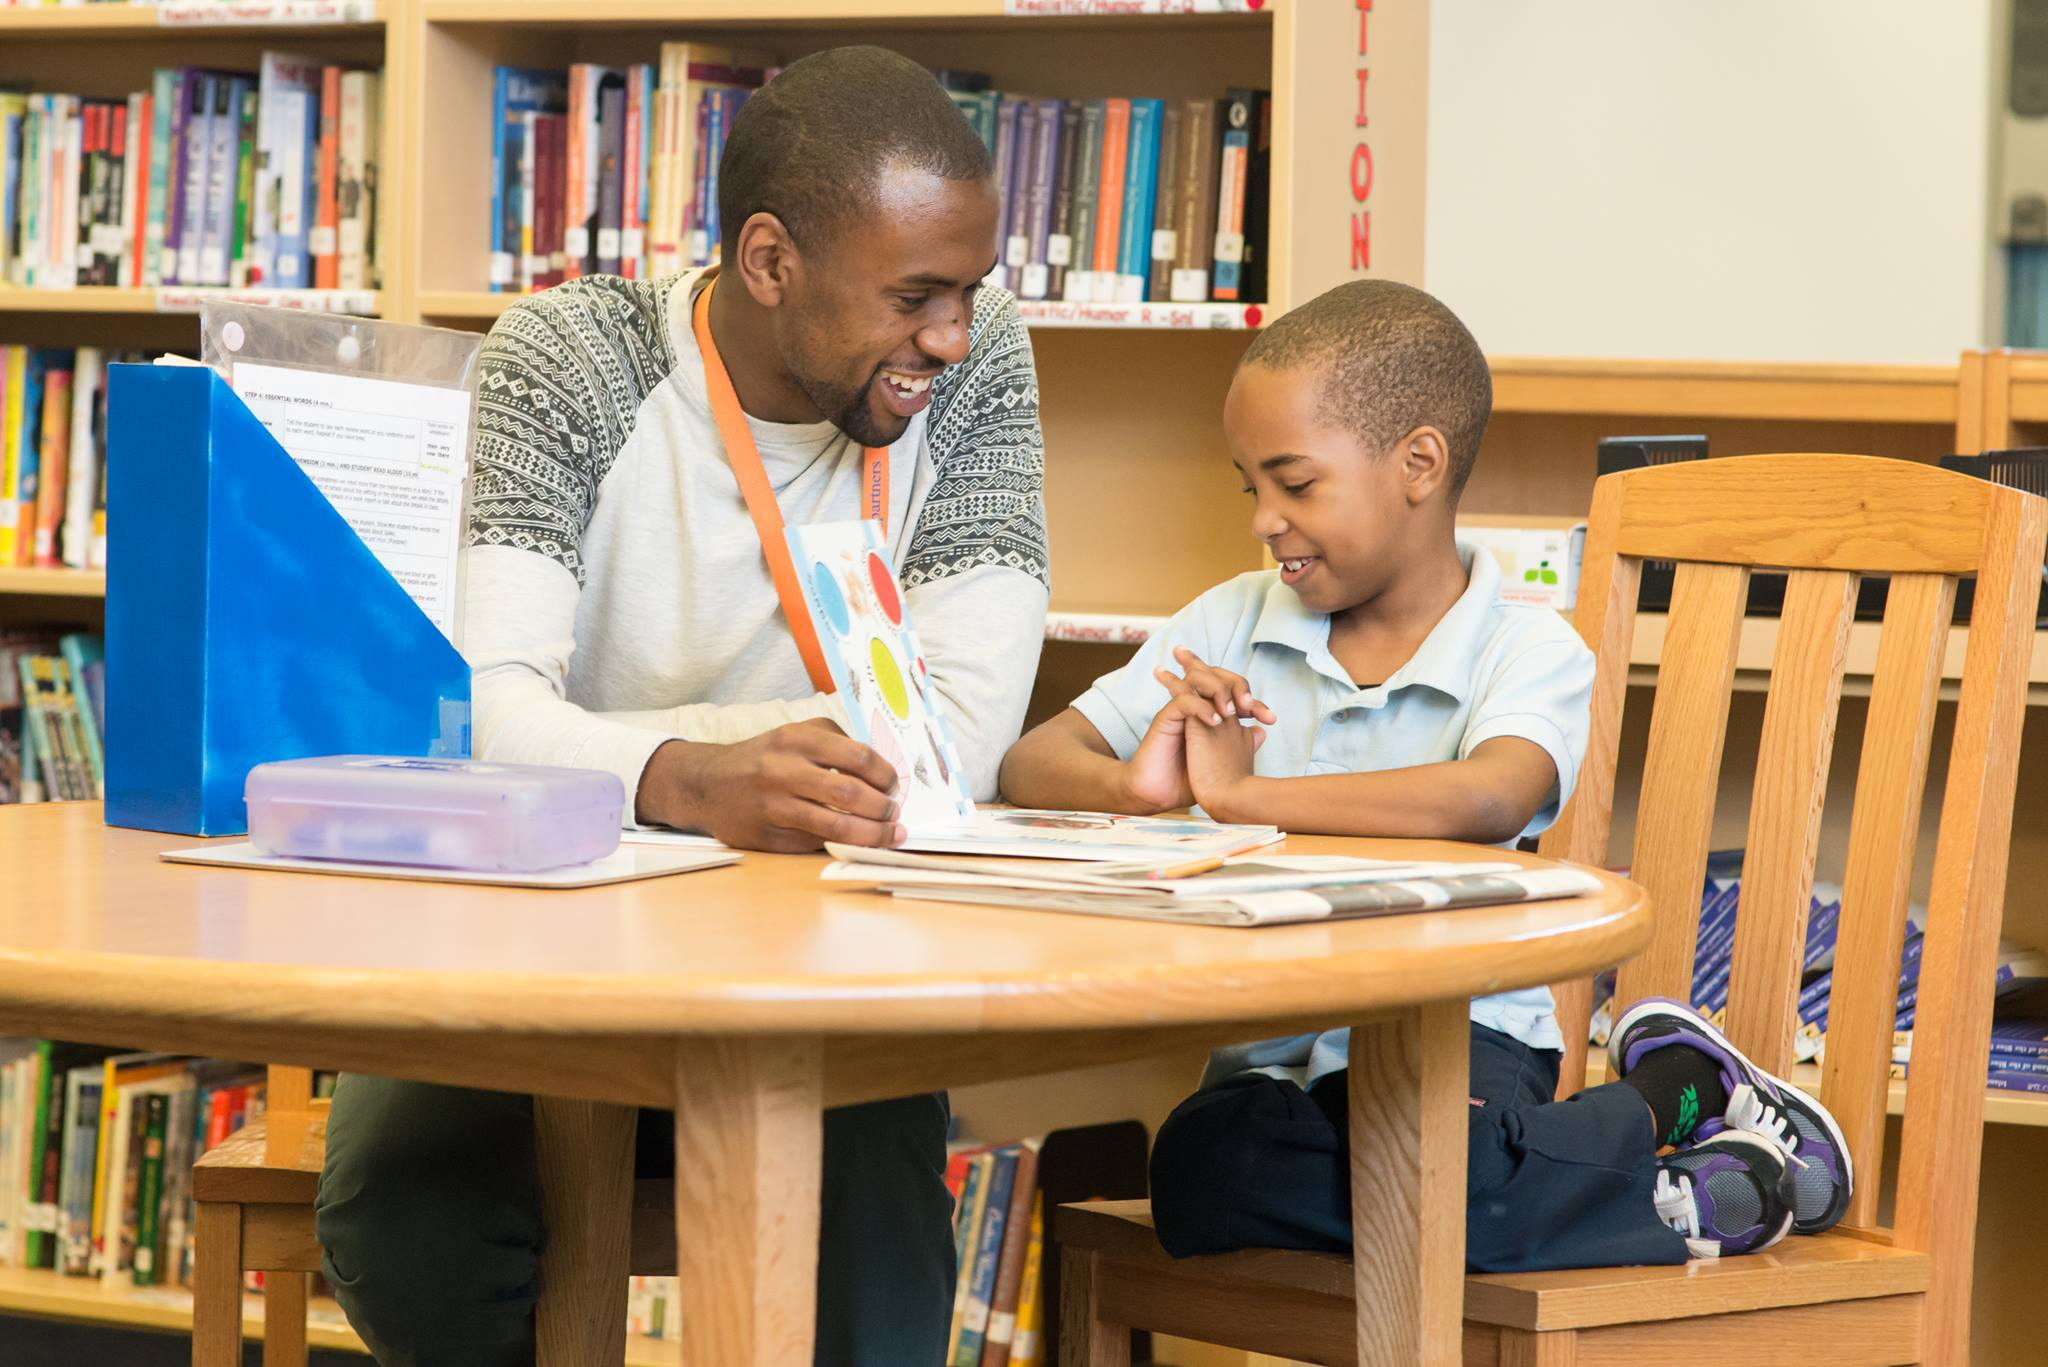 Mentor helping child